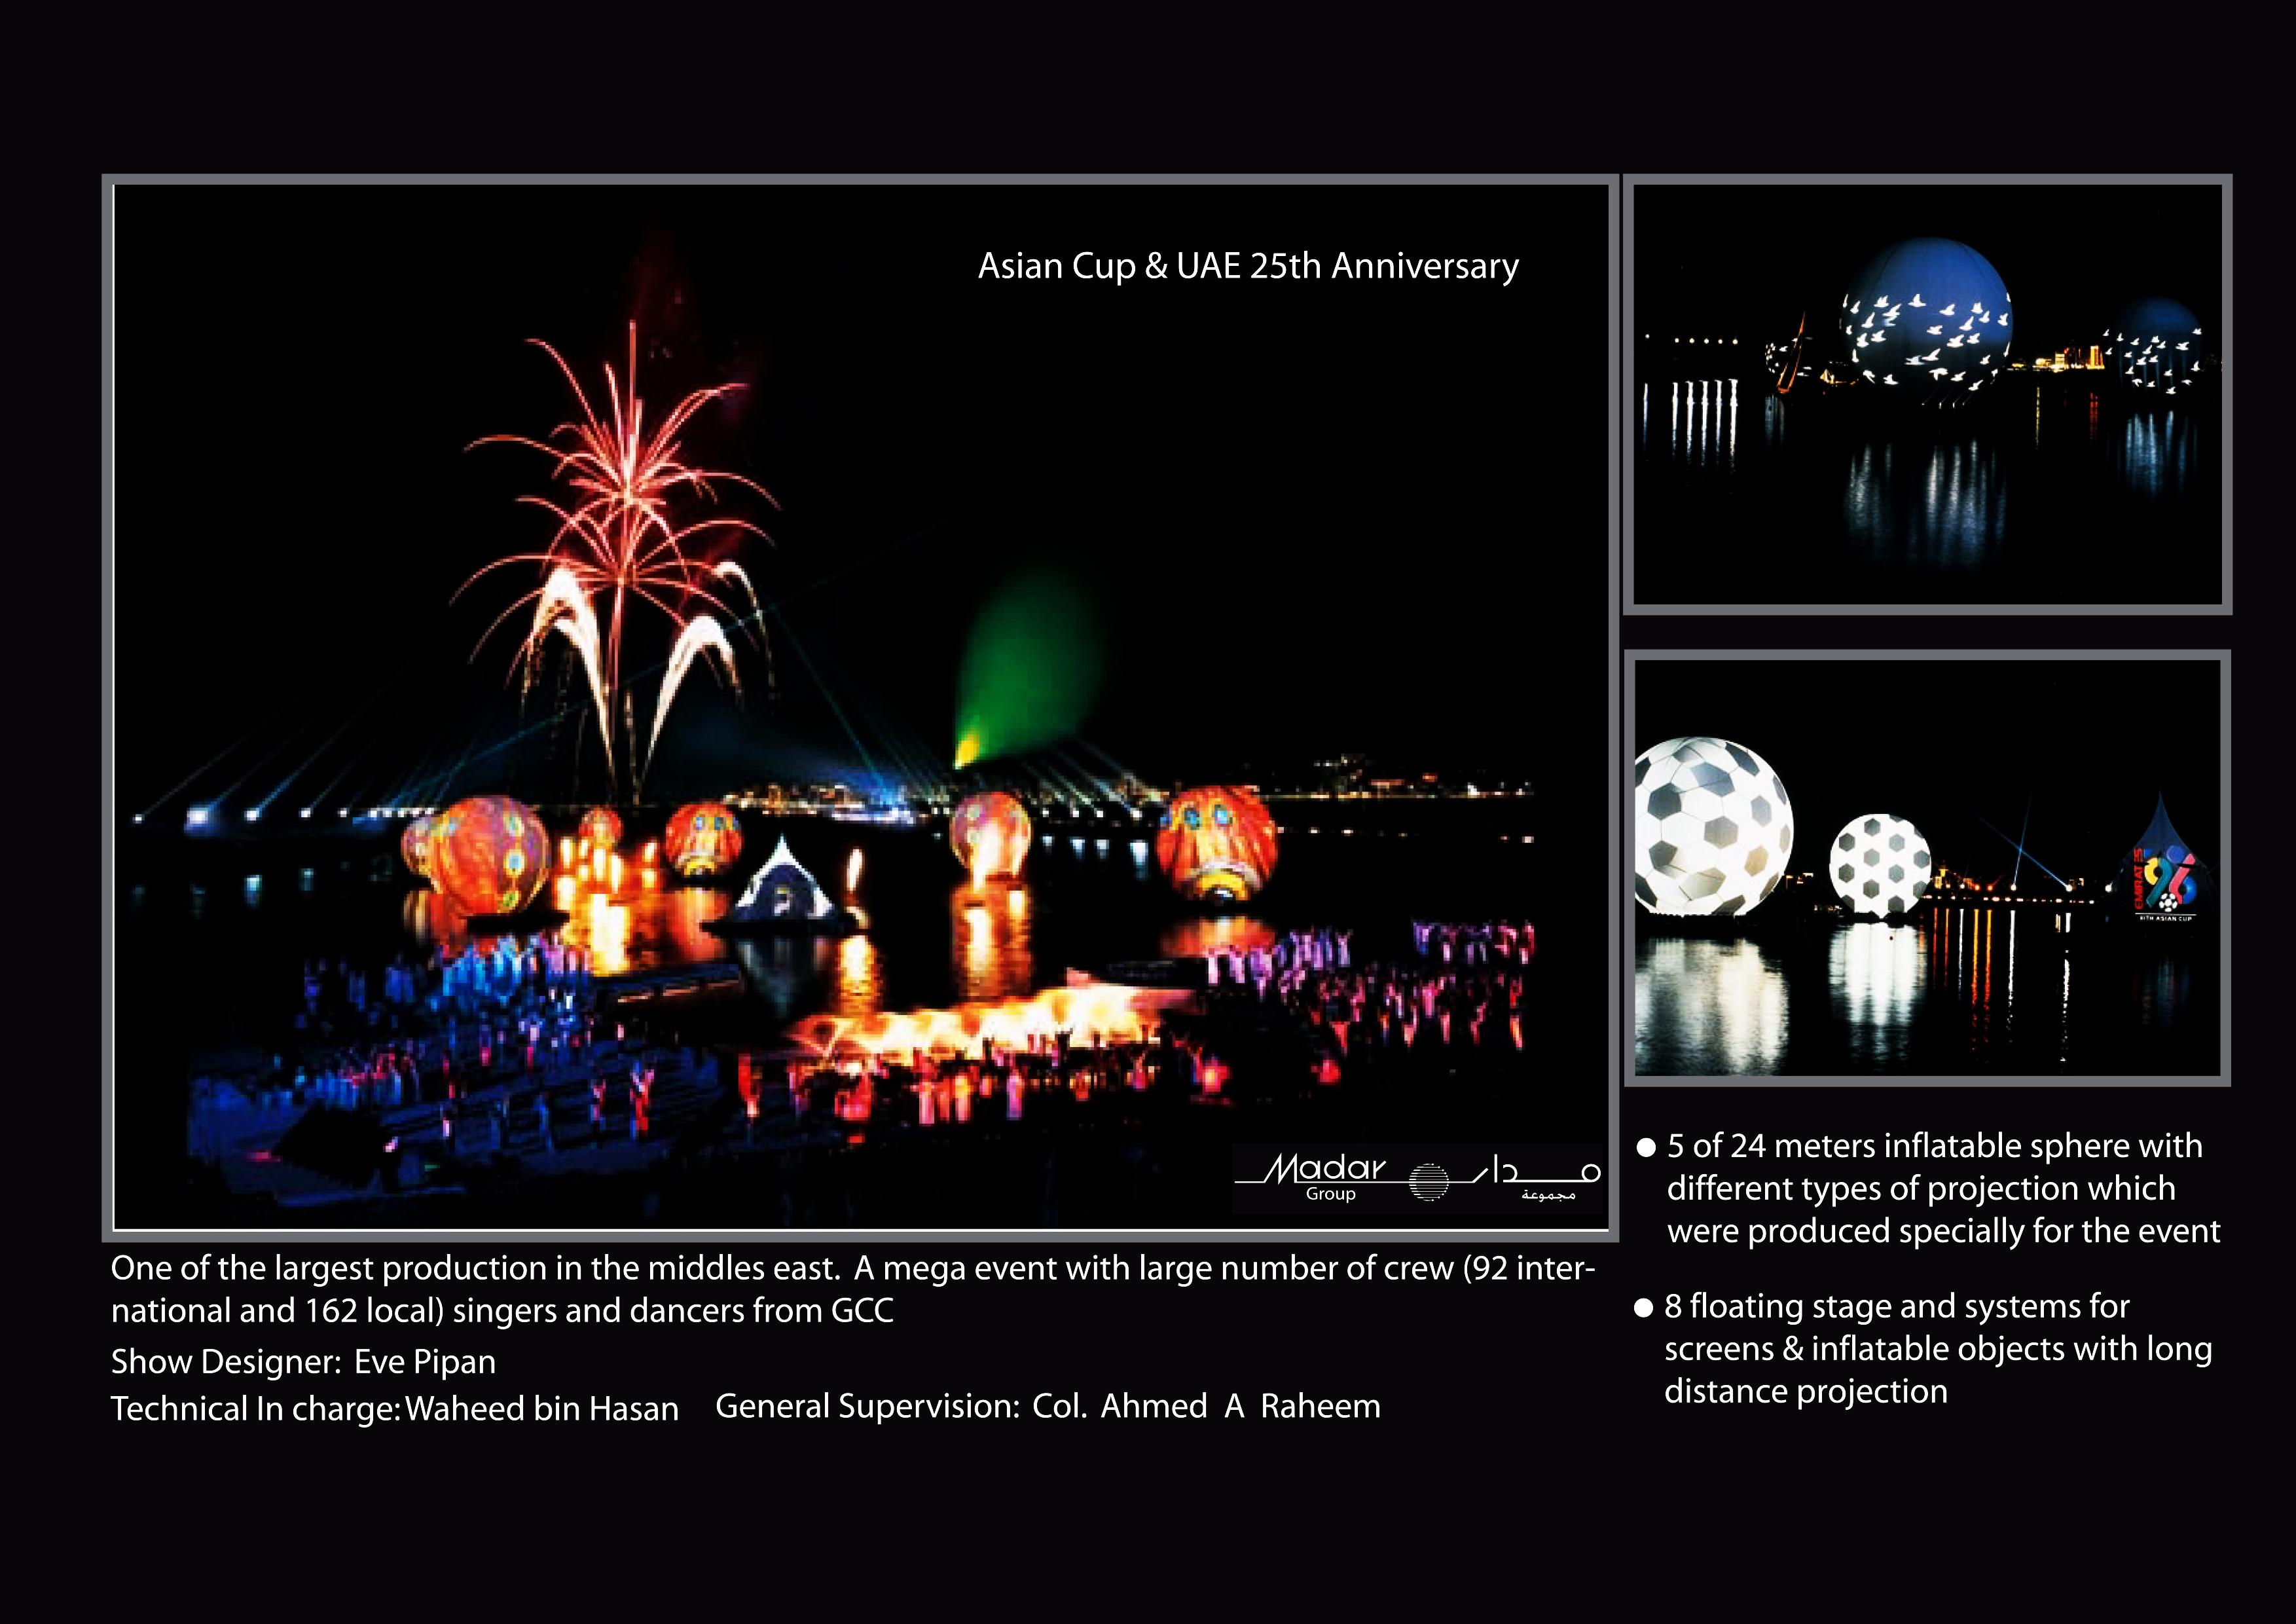 AsianCup OpeningCeremony in AbuDhabi